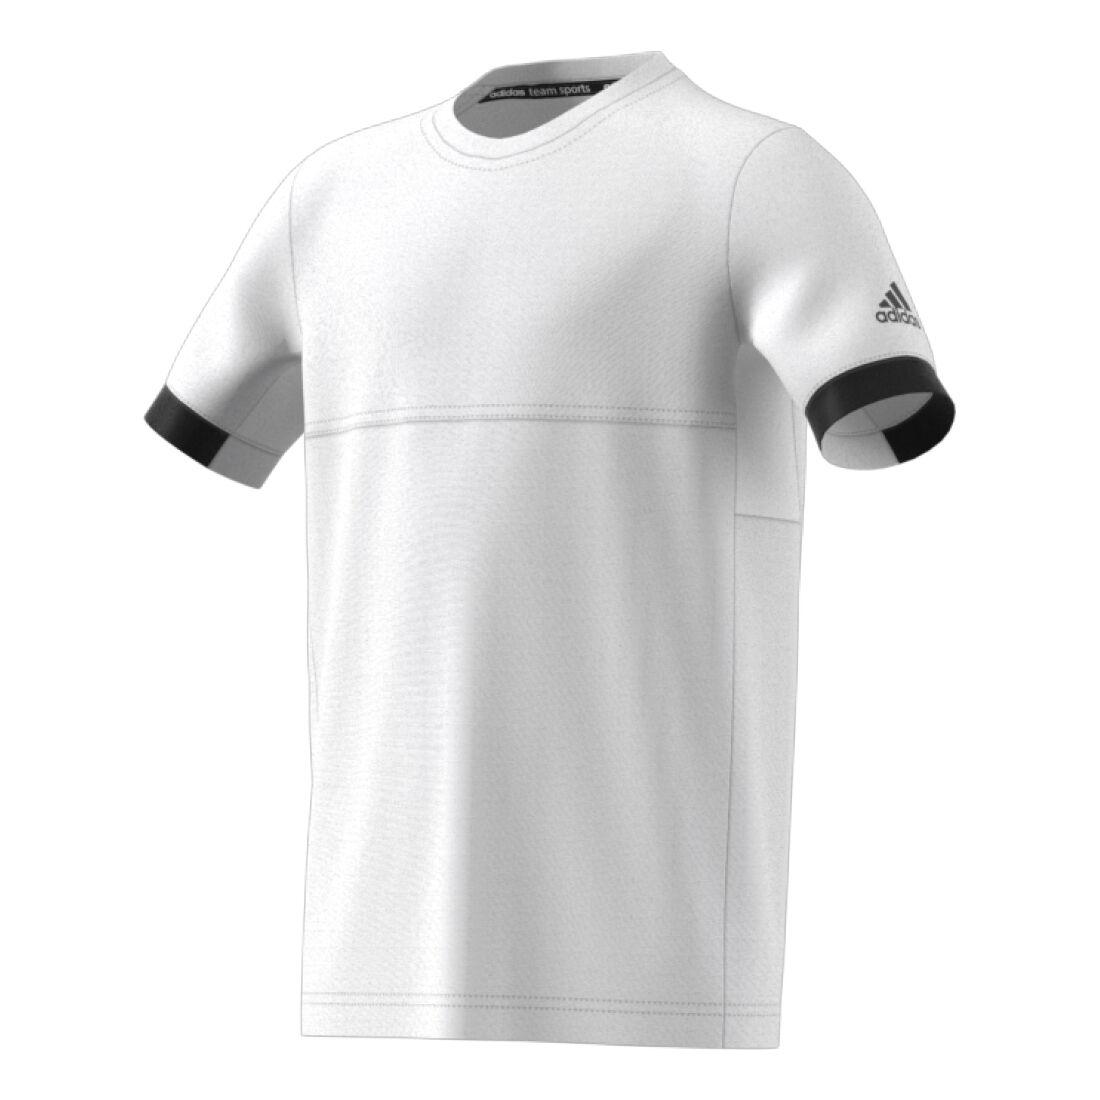 adidas Climacool T16 T Shirt Jungen Weiß, Schwarz online